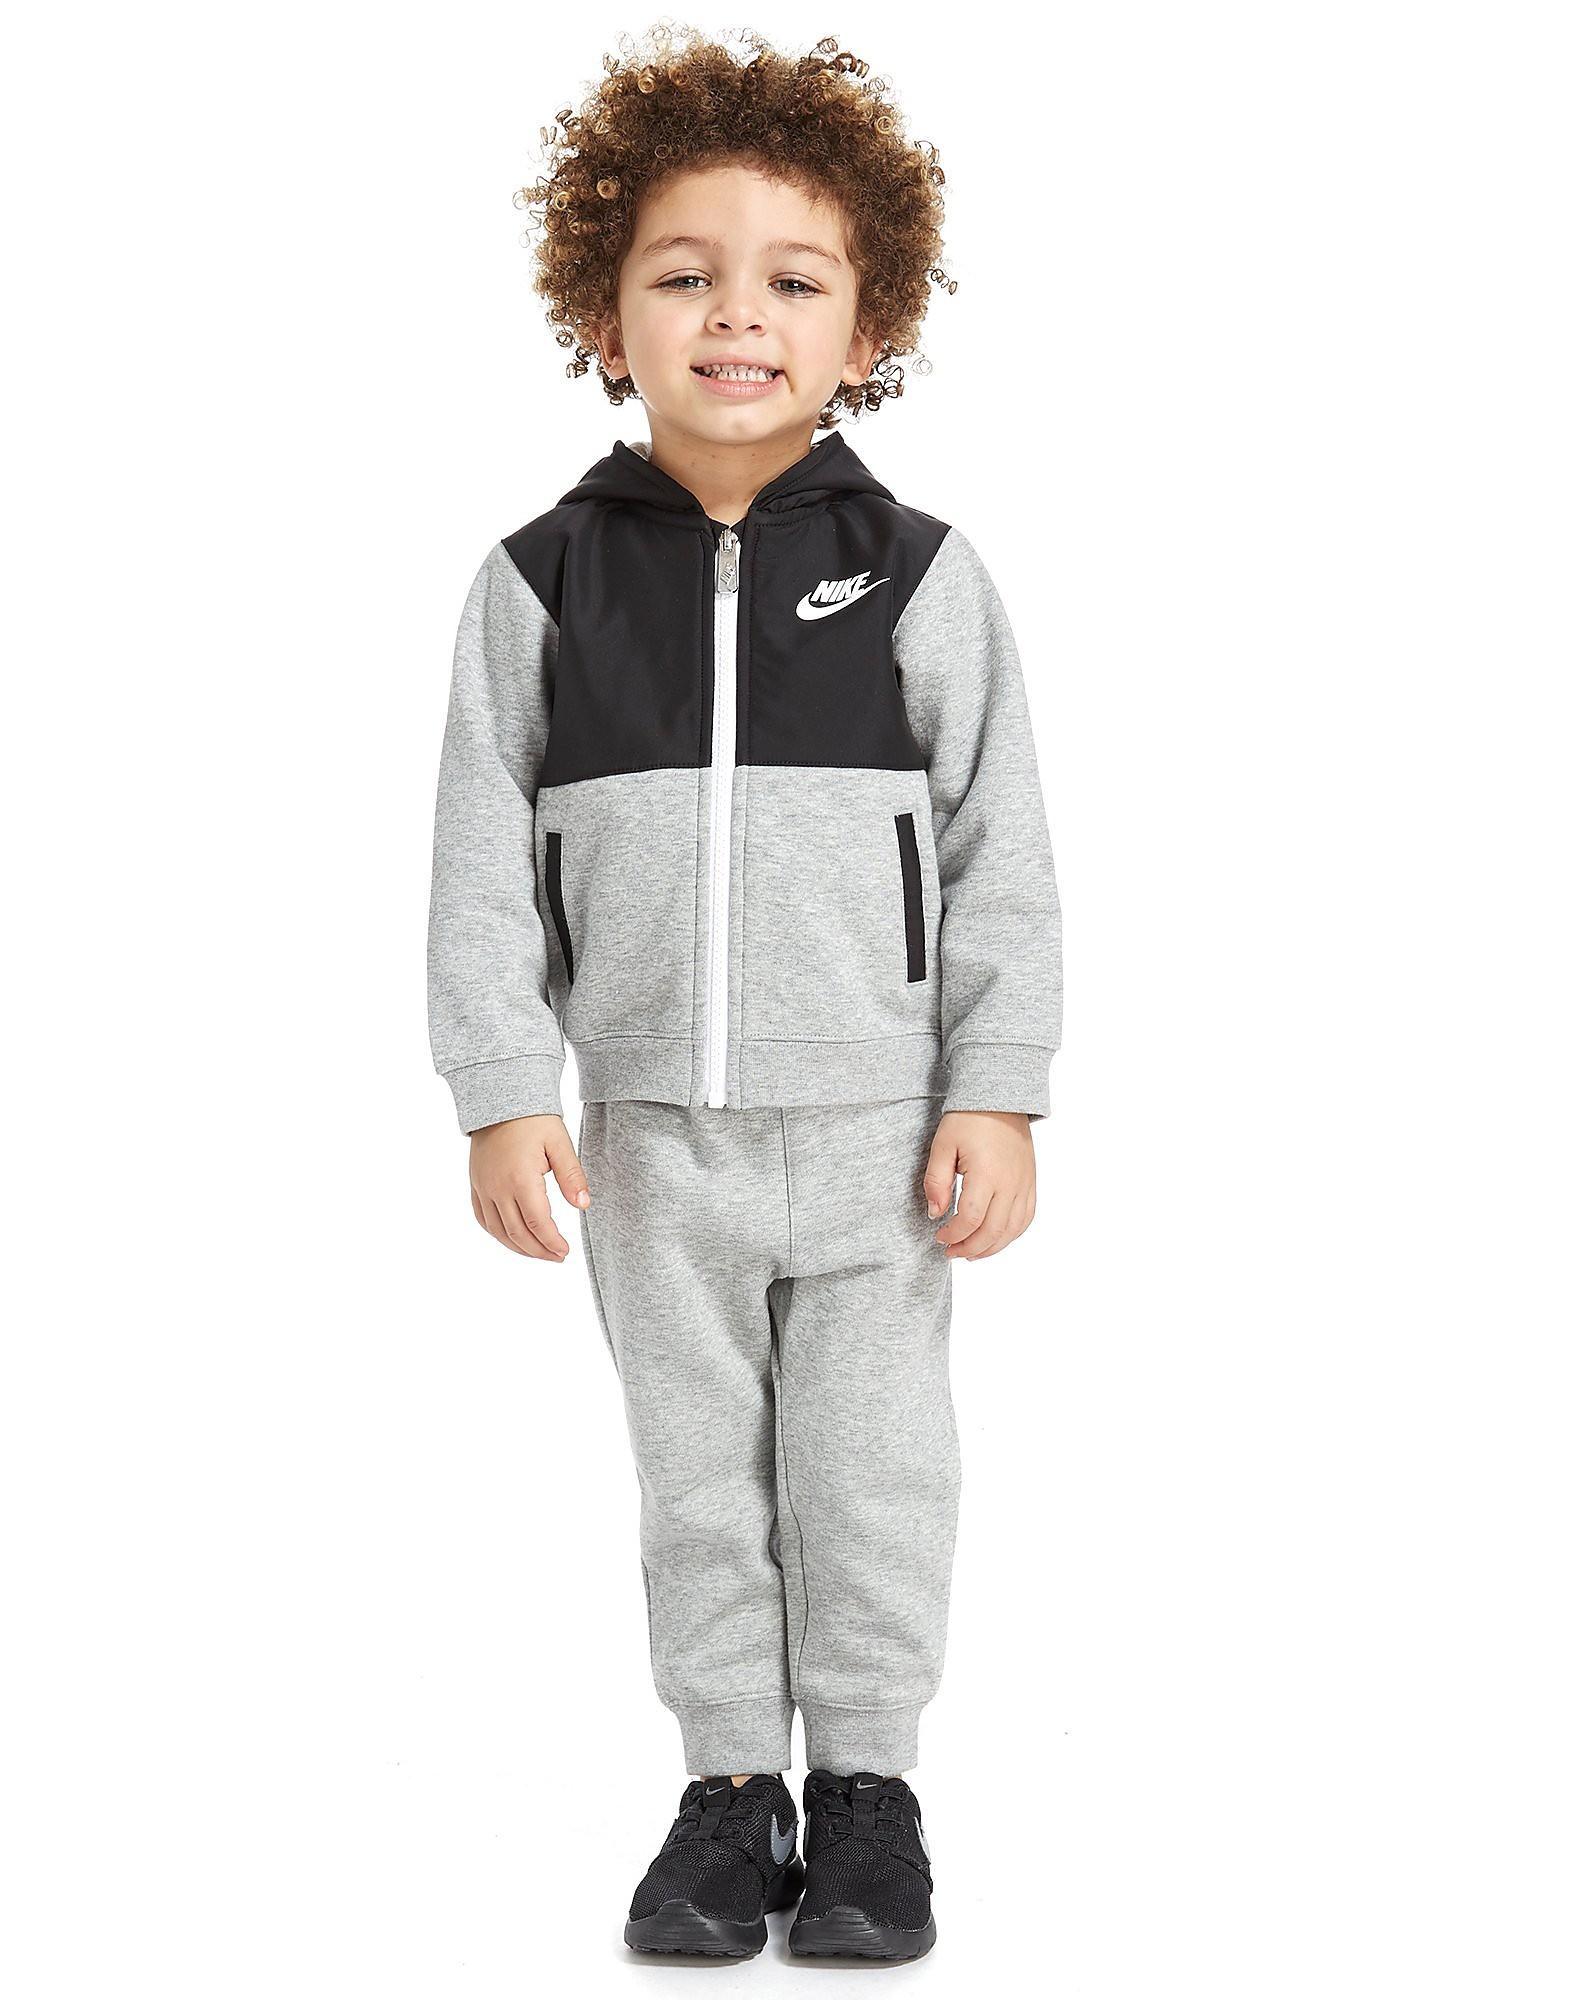 Nike Ensemble survêtement Woven Mix Enfant